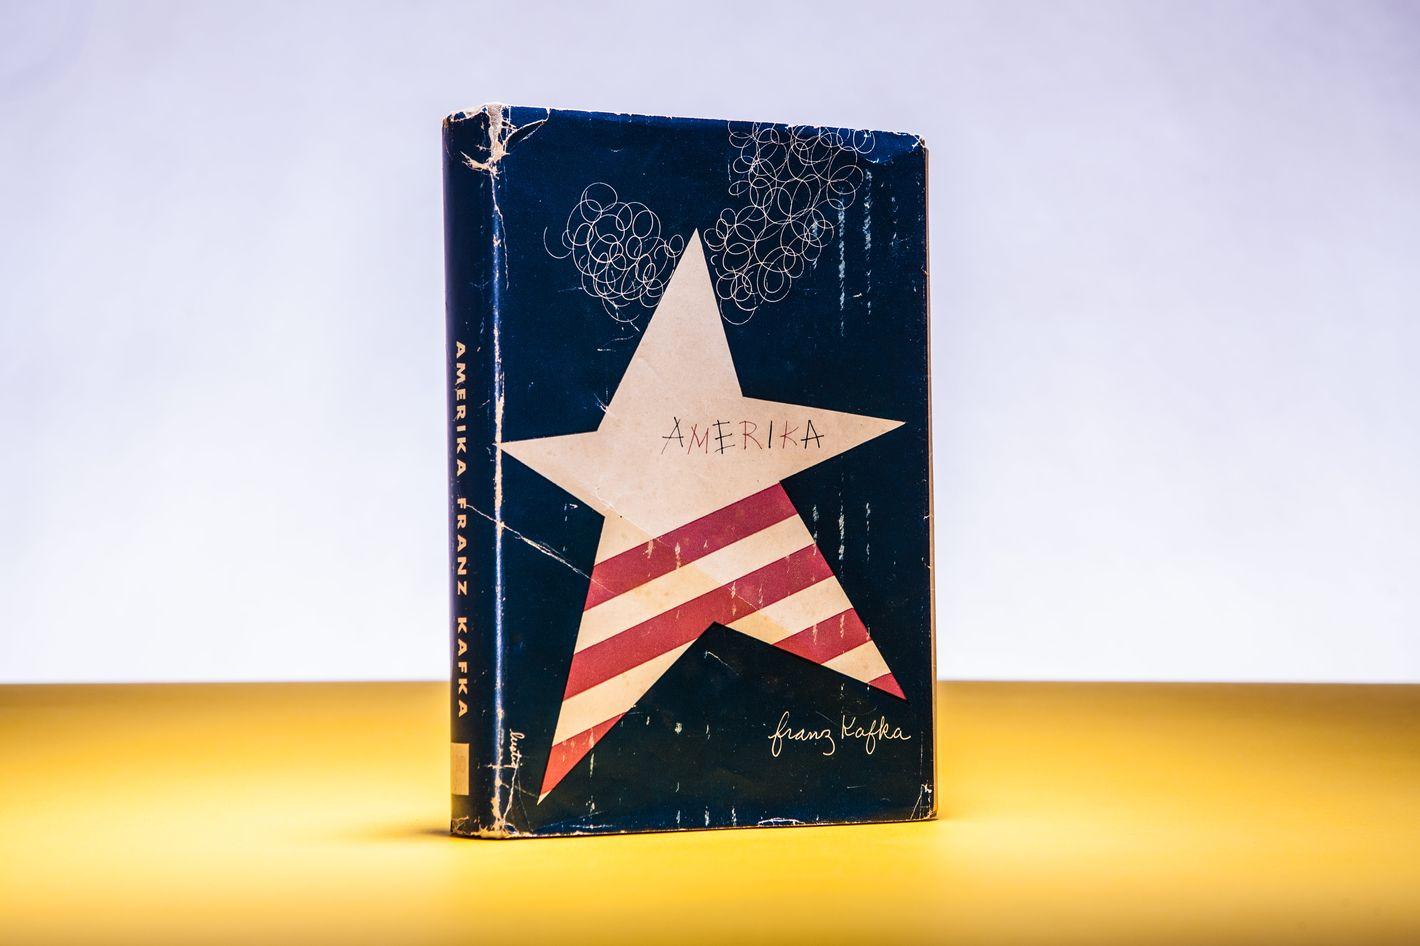 'Amerika,' Franz Kafka